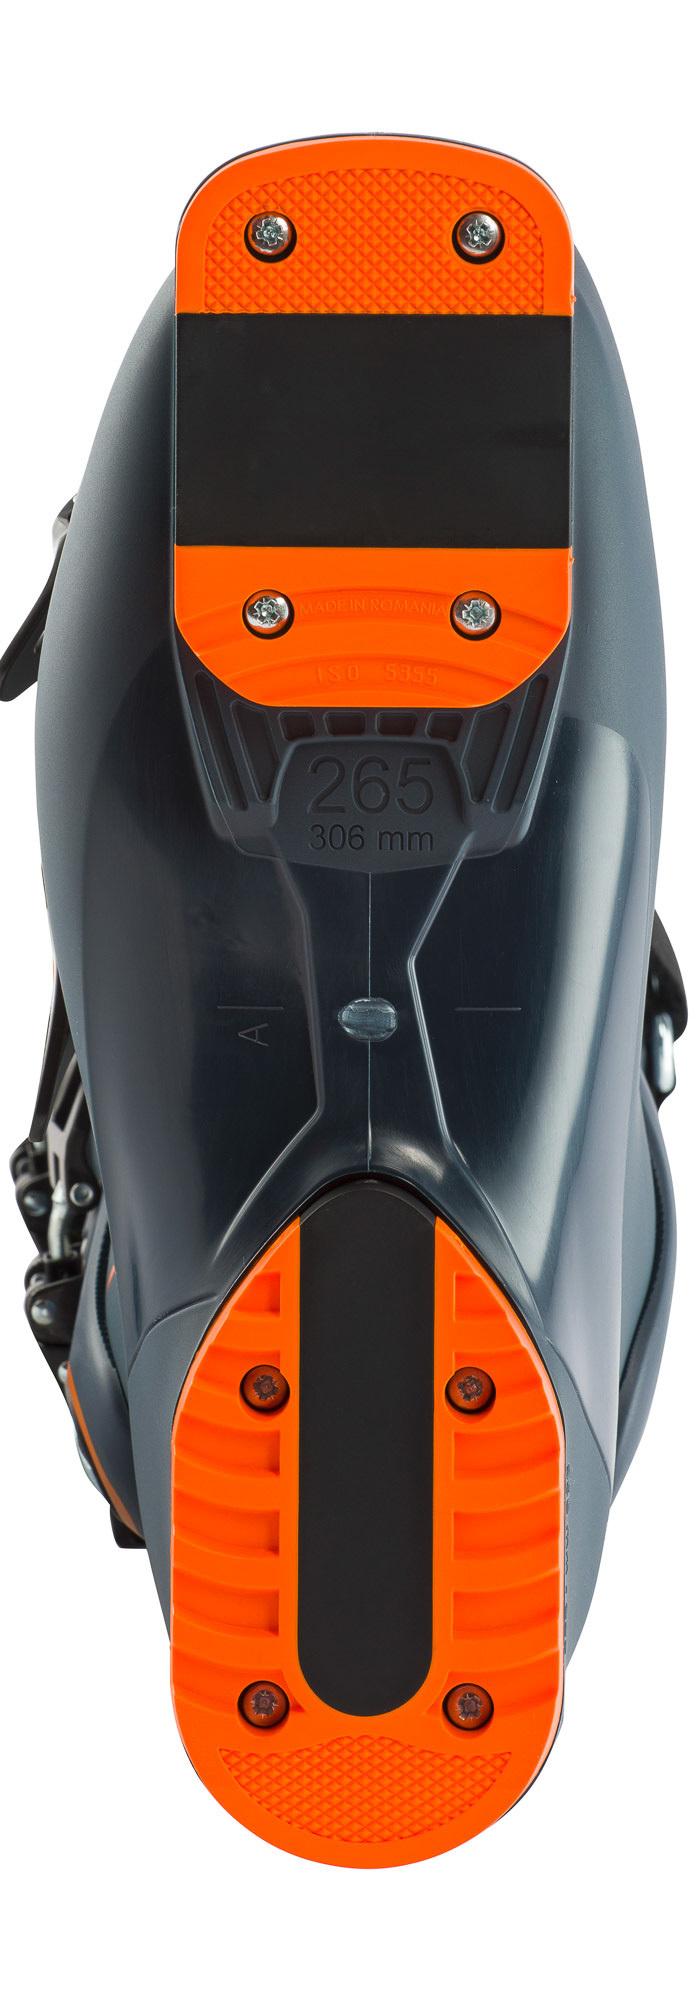 LX 120-5